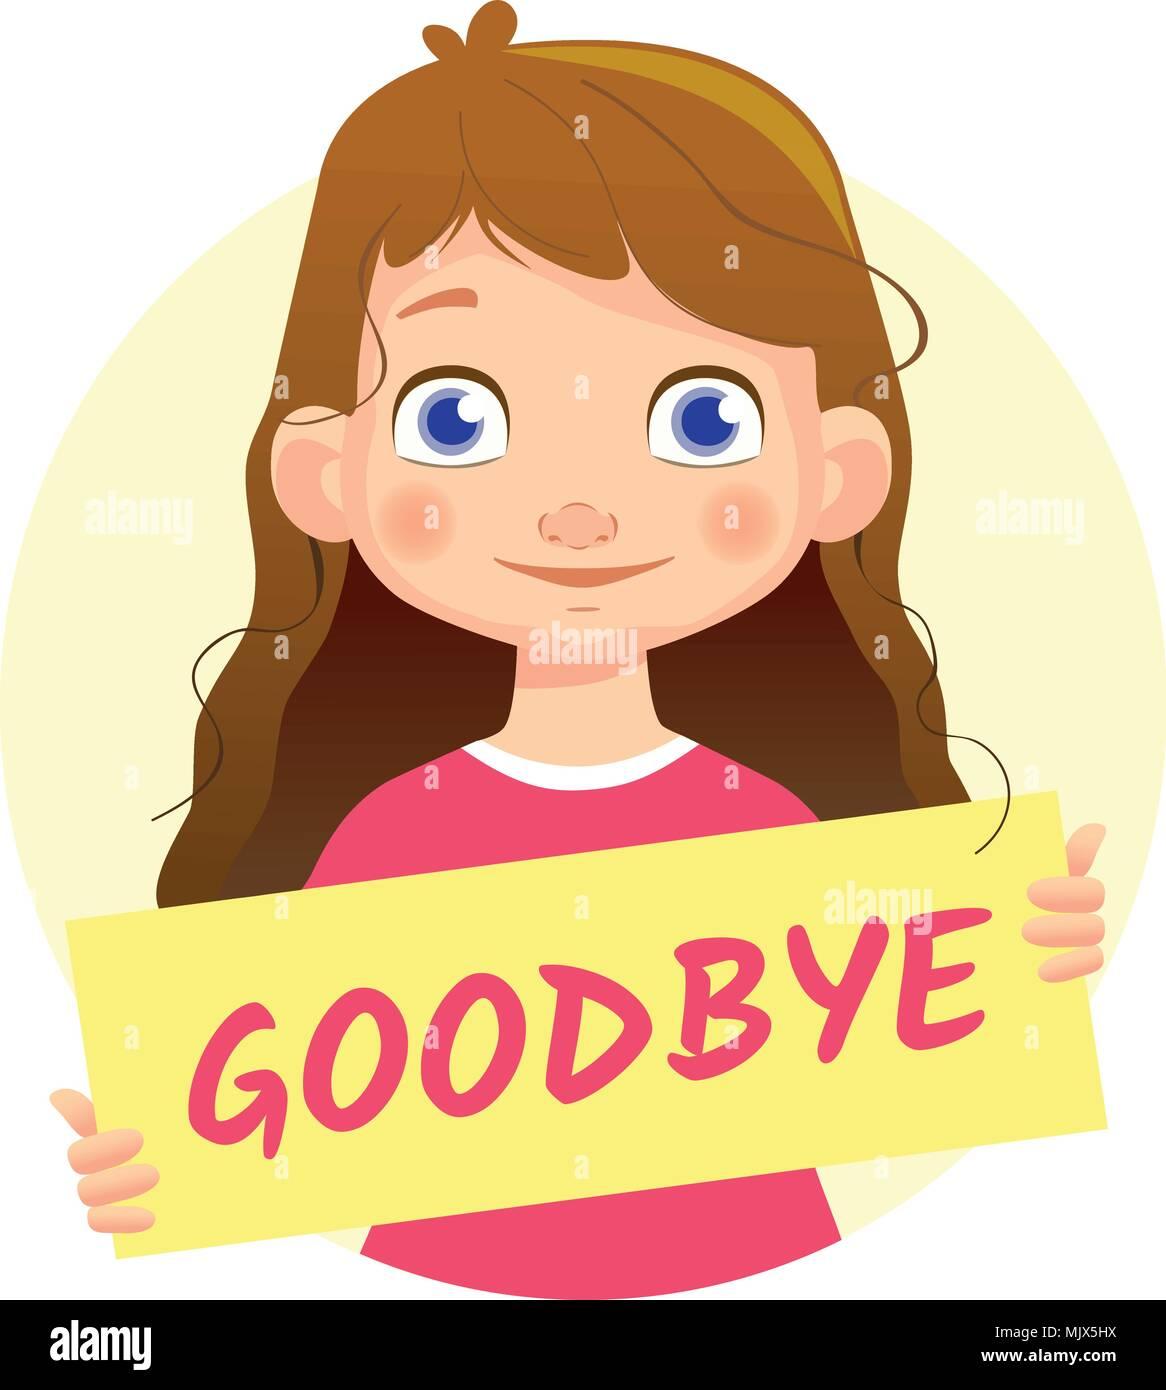 Girl holding Goodbye poster - Stock Image